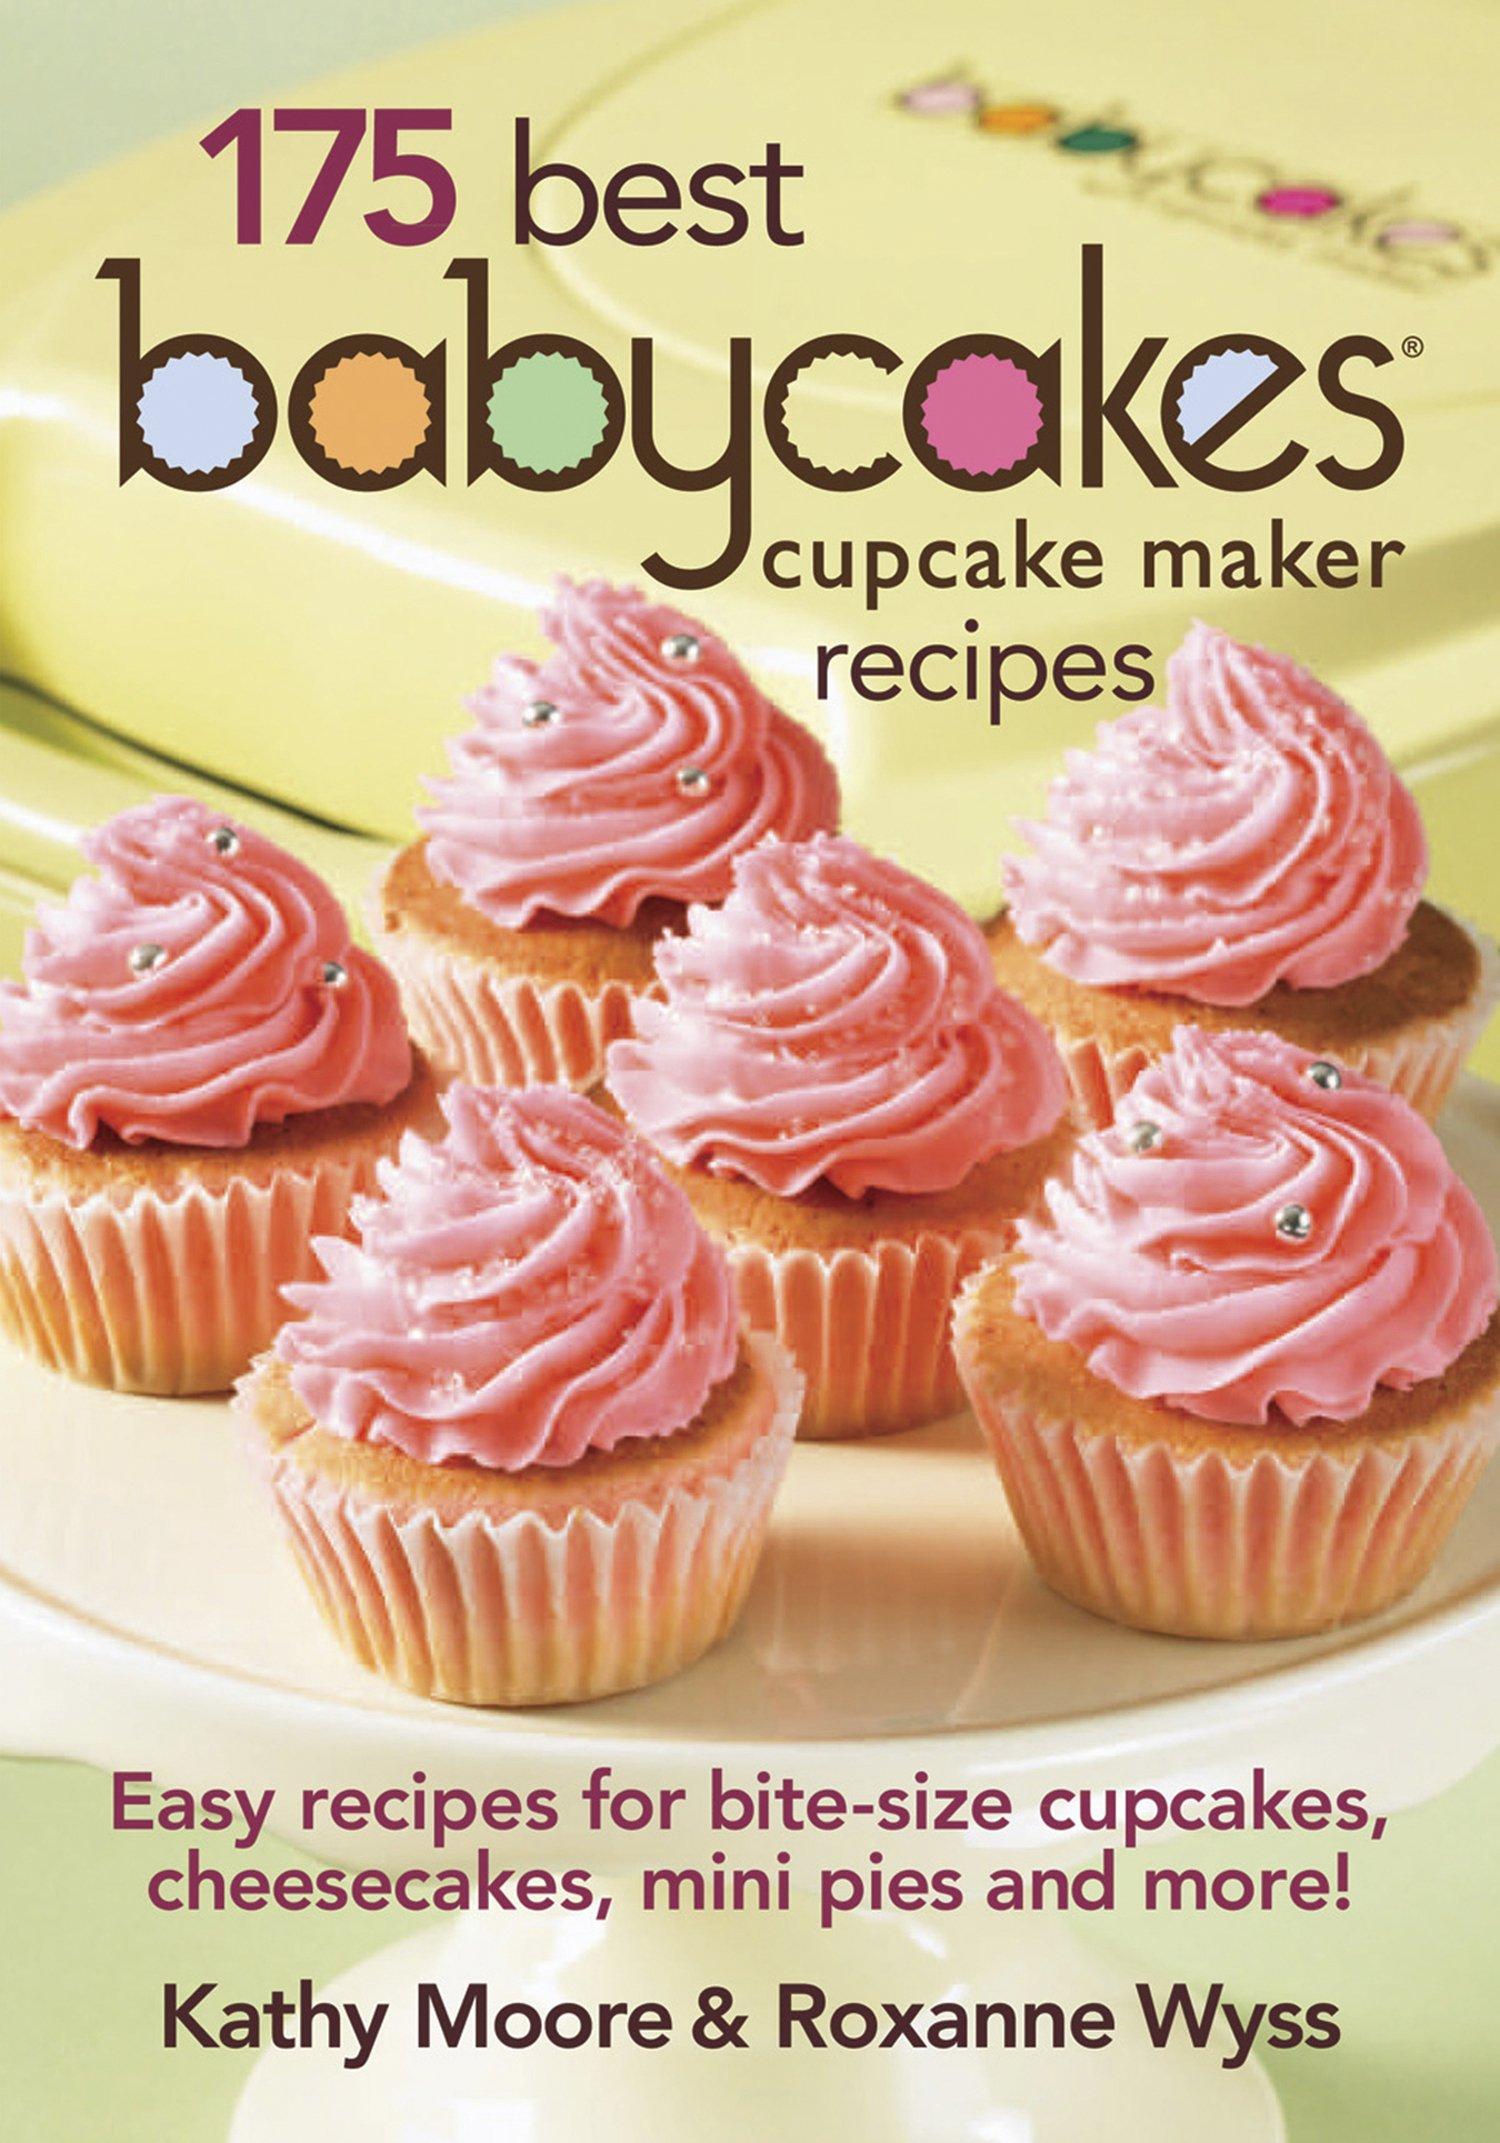 Babycakes Cupcake Cookbook - 175 Best Cupcake Maker Recipes by Babycakes